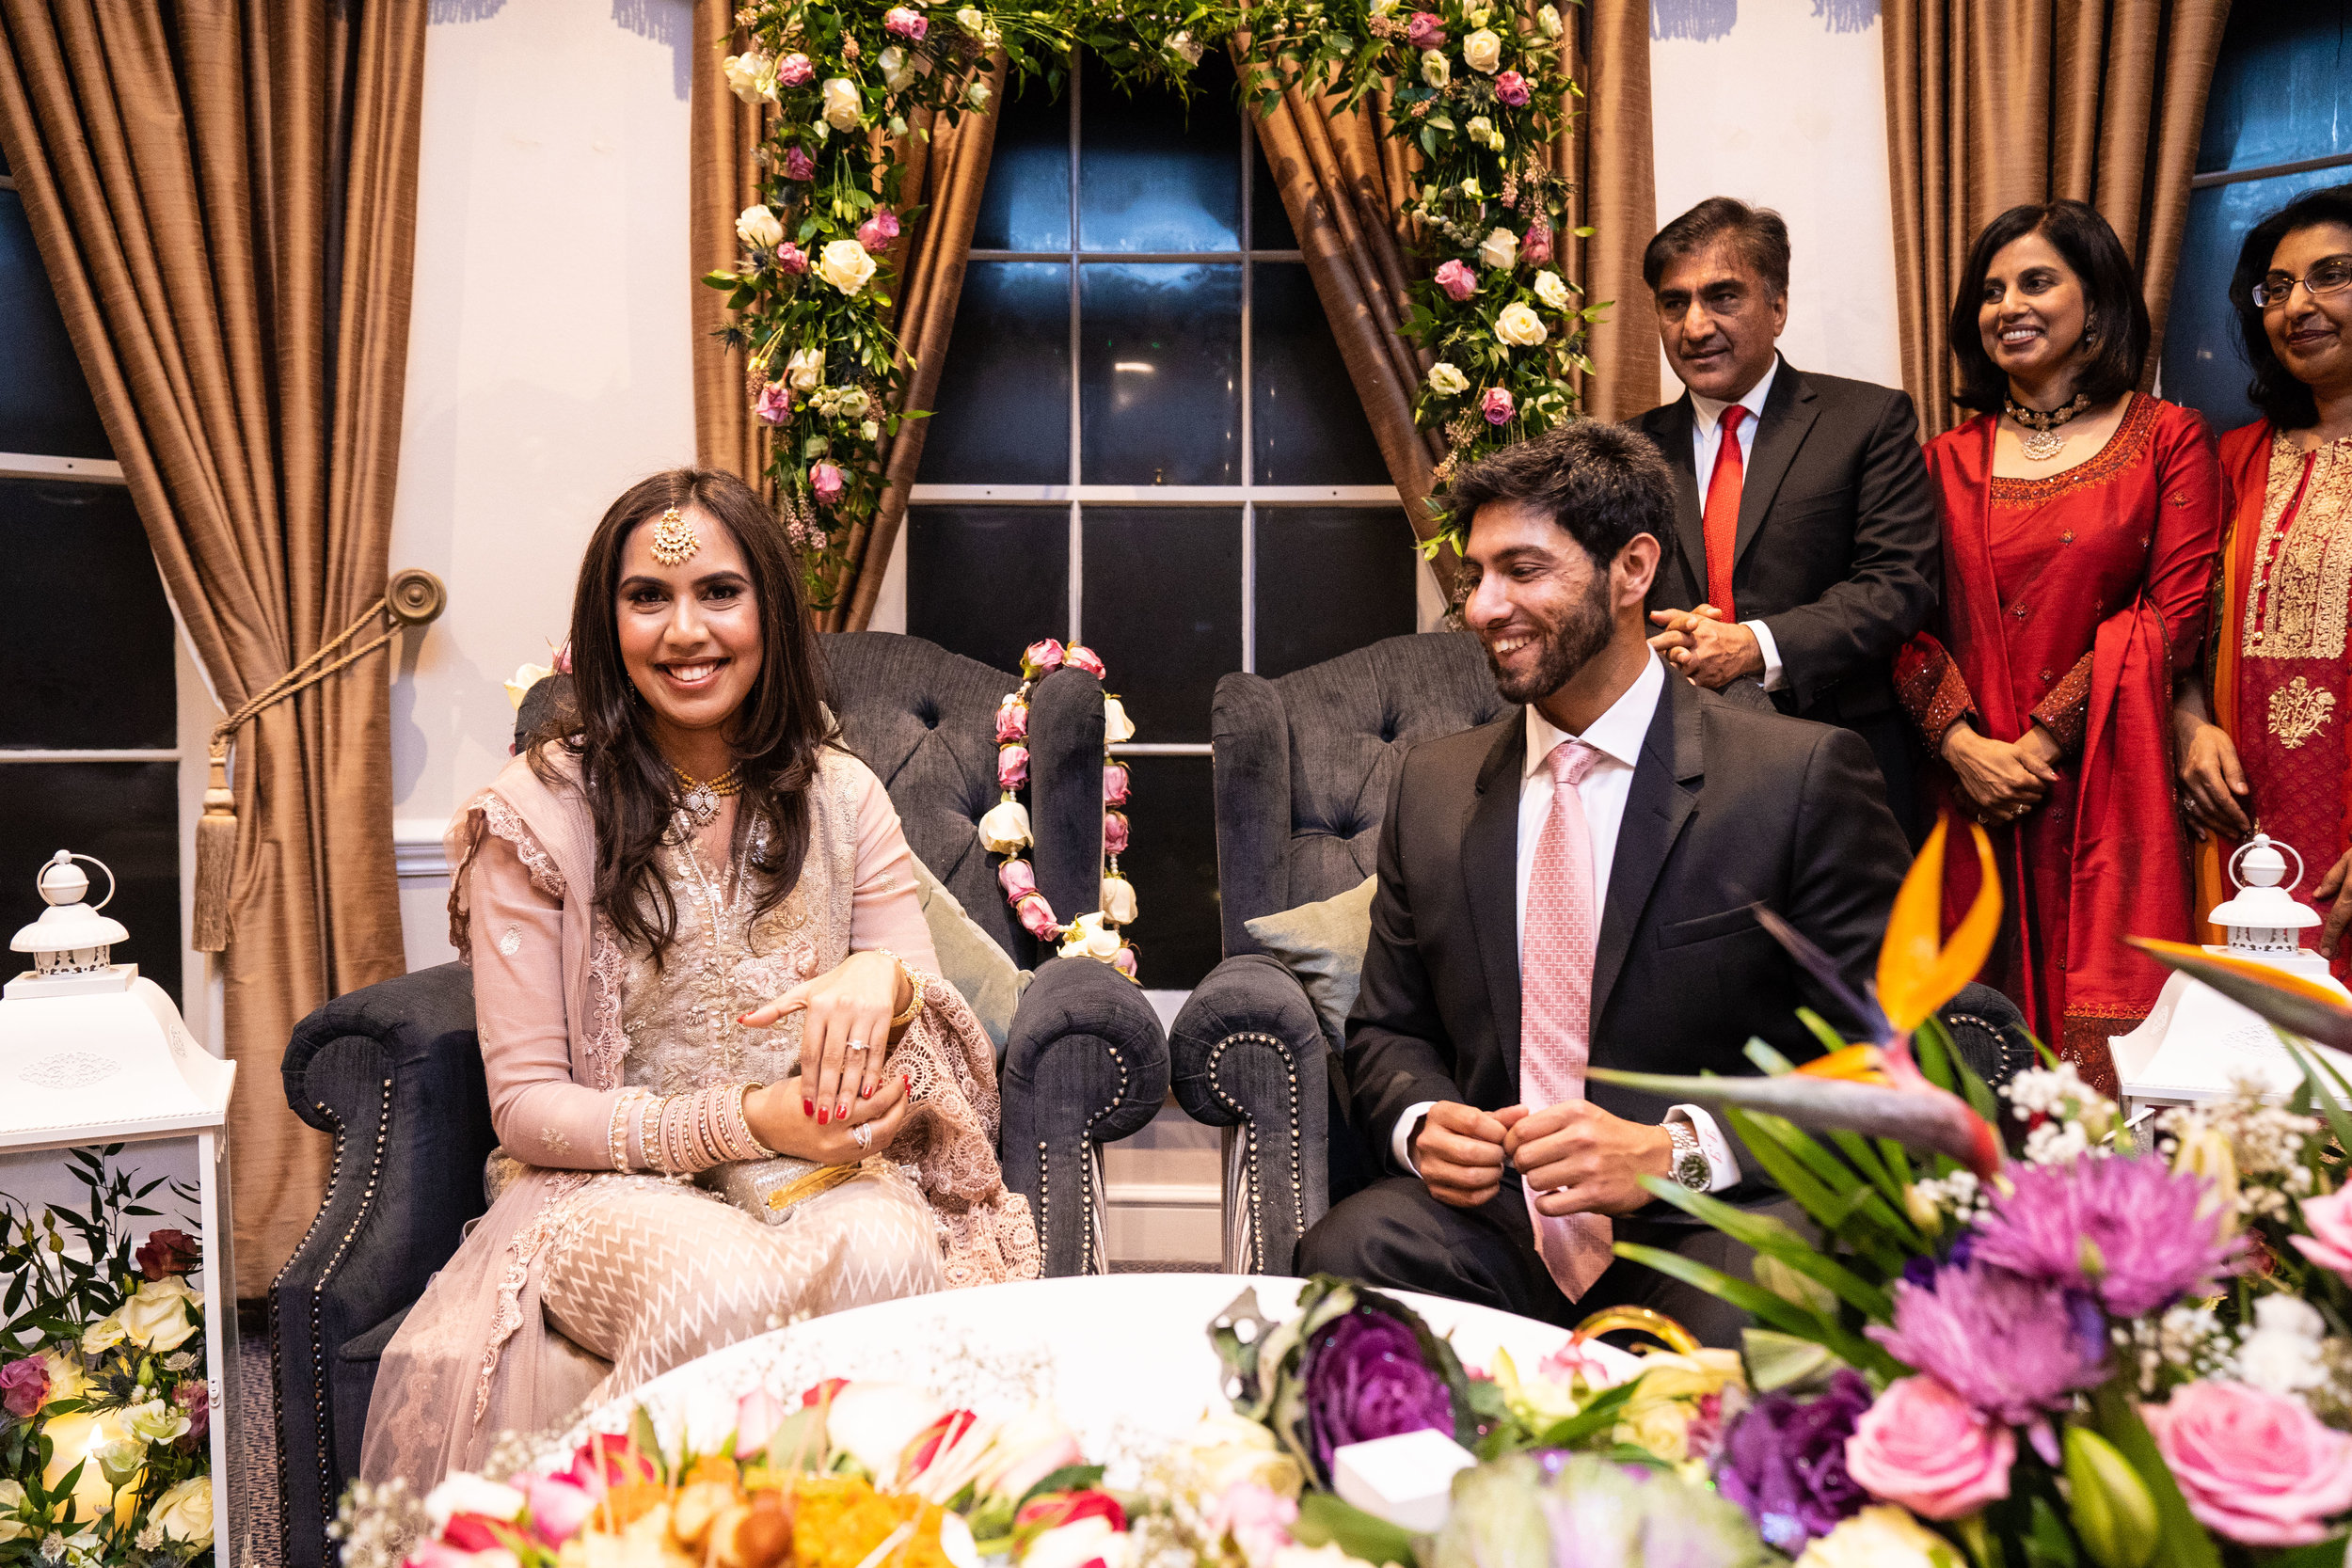 buckinghamshire-golf-club-winter-muslim-wedding-engagement-photography-videography-23